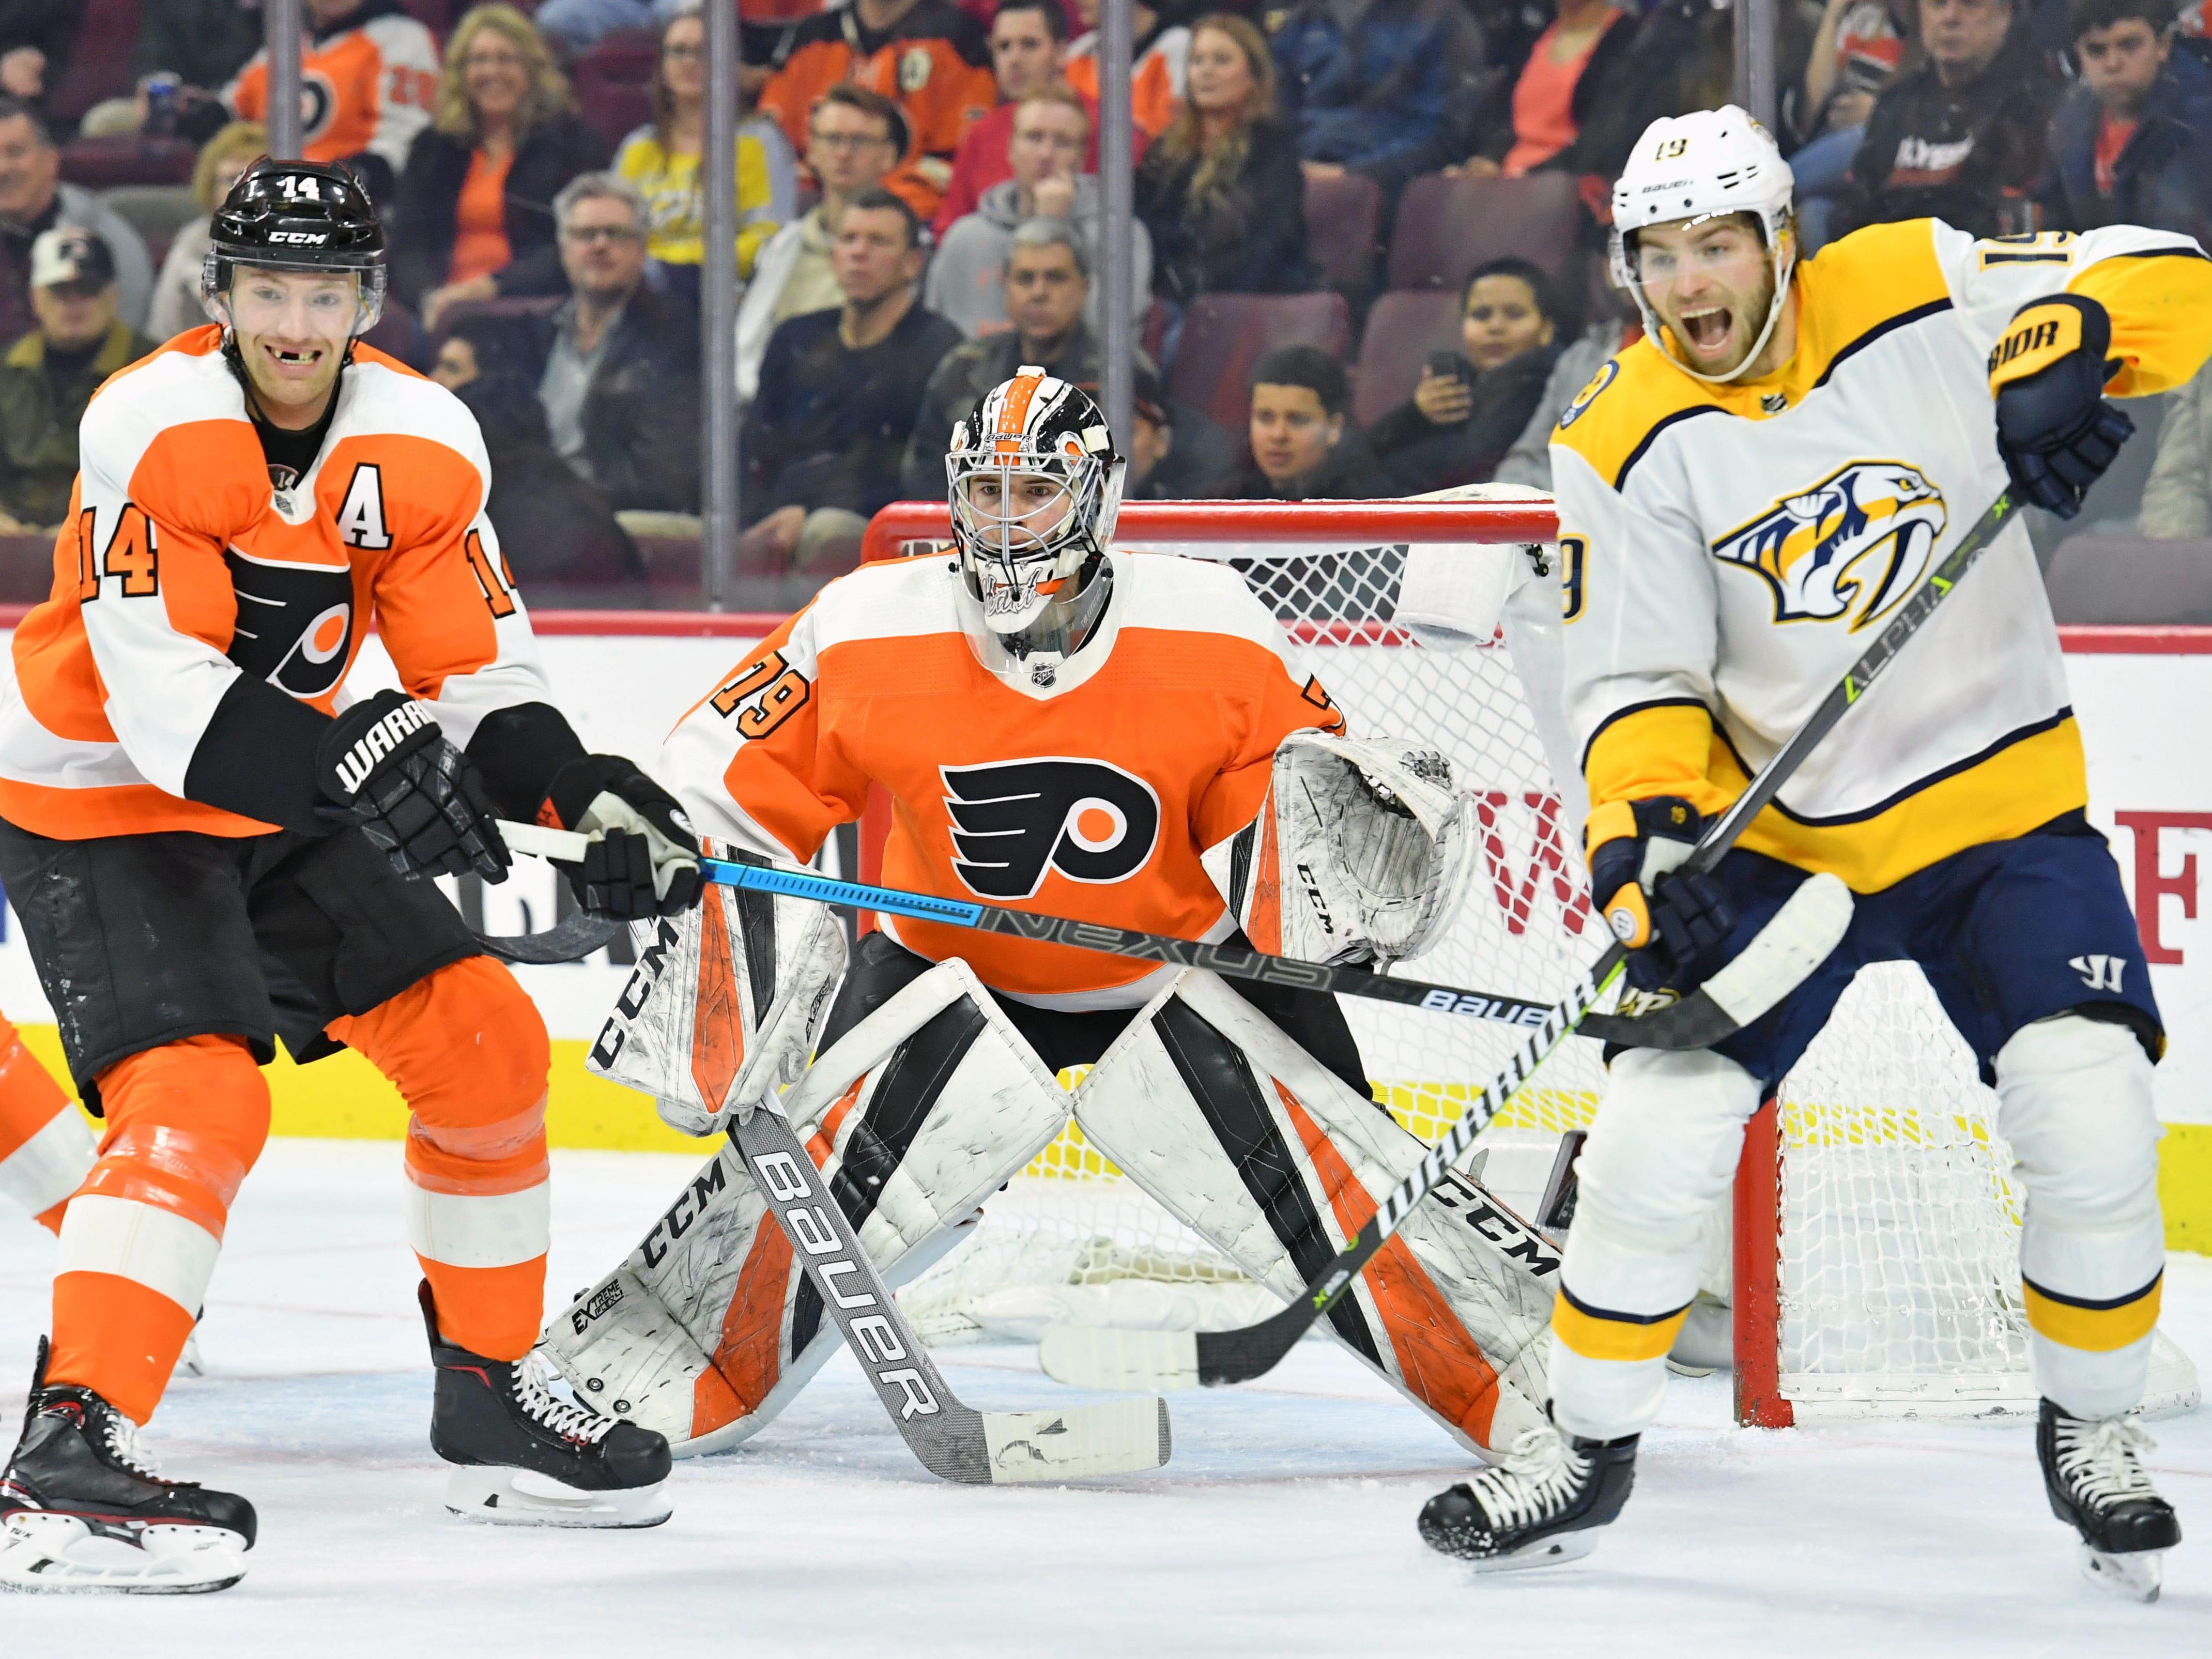 Philadelphia Flyers center Sean Couturier (14) battles with Nashville Predators center Calle Jarnkrok (19) in front of goaltender Carter Hart (79) during the first period at Wells Fargo Center.